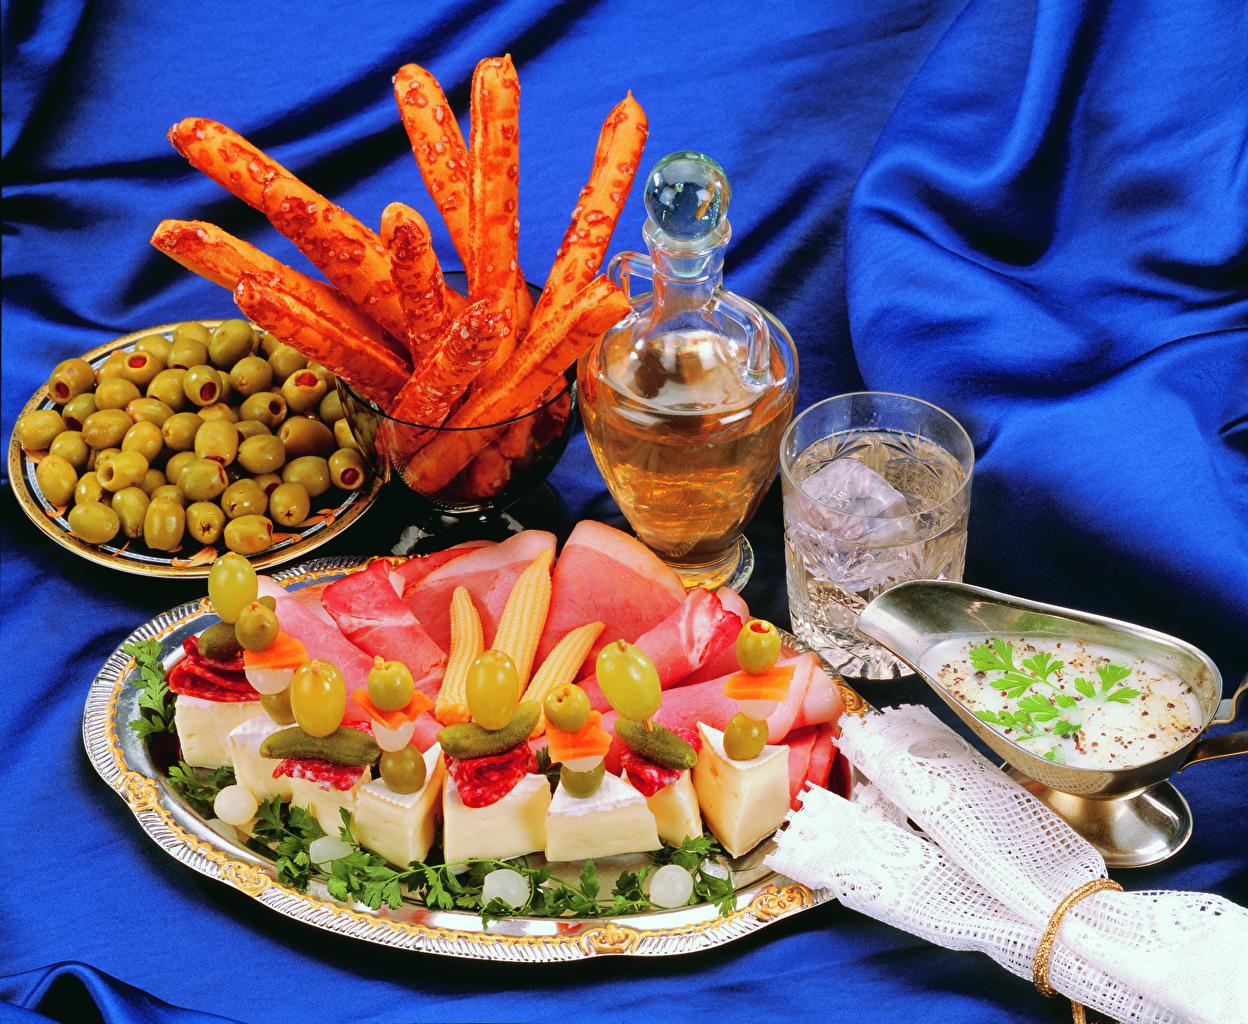 Картинка Оливки Сыры Стакан Ветчина Еда Тарелка стакана стакане Пища тарелке Продукты питания